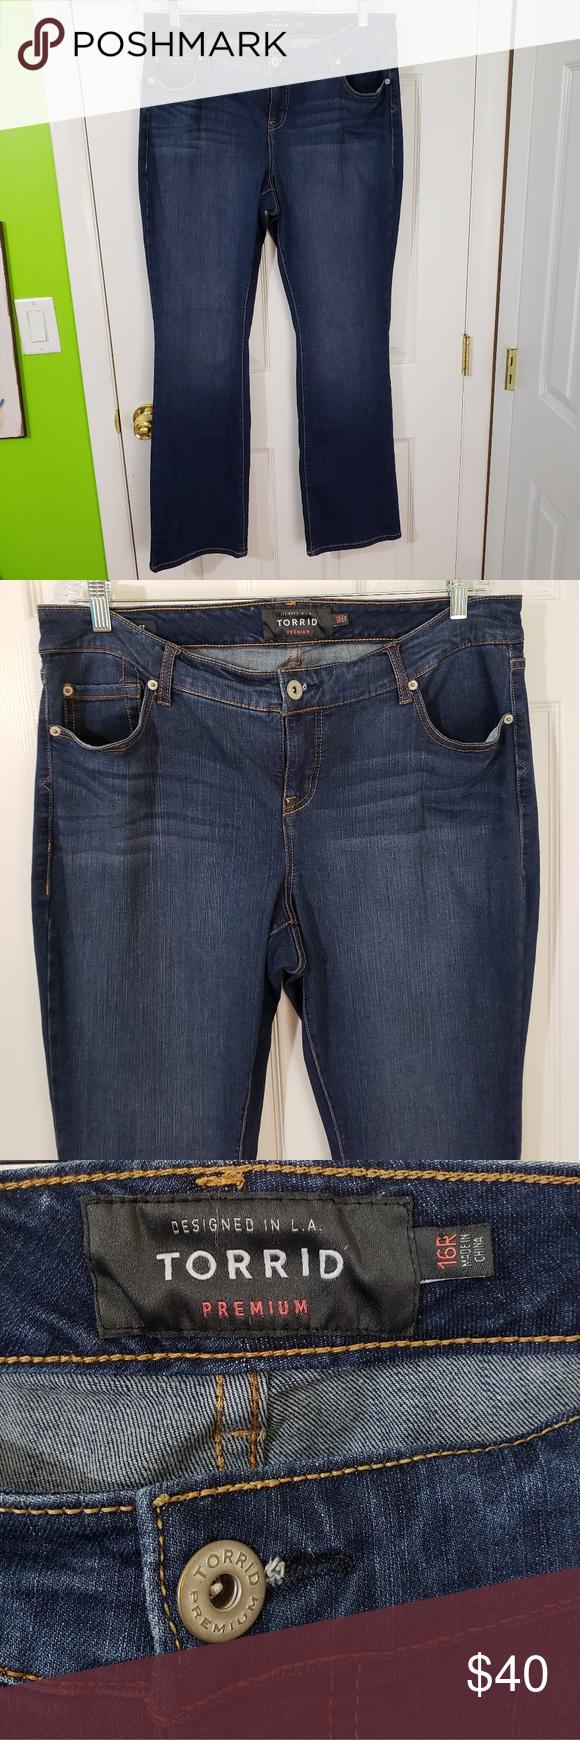 ➕Torrid Premium Denim Barely Boot Jeans